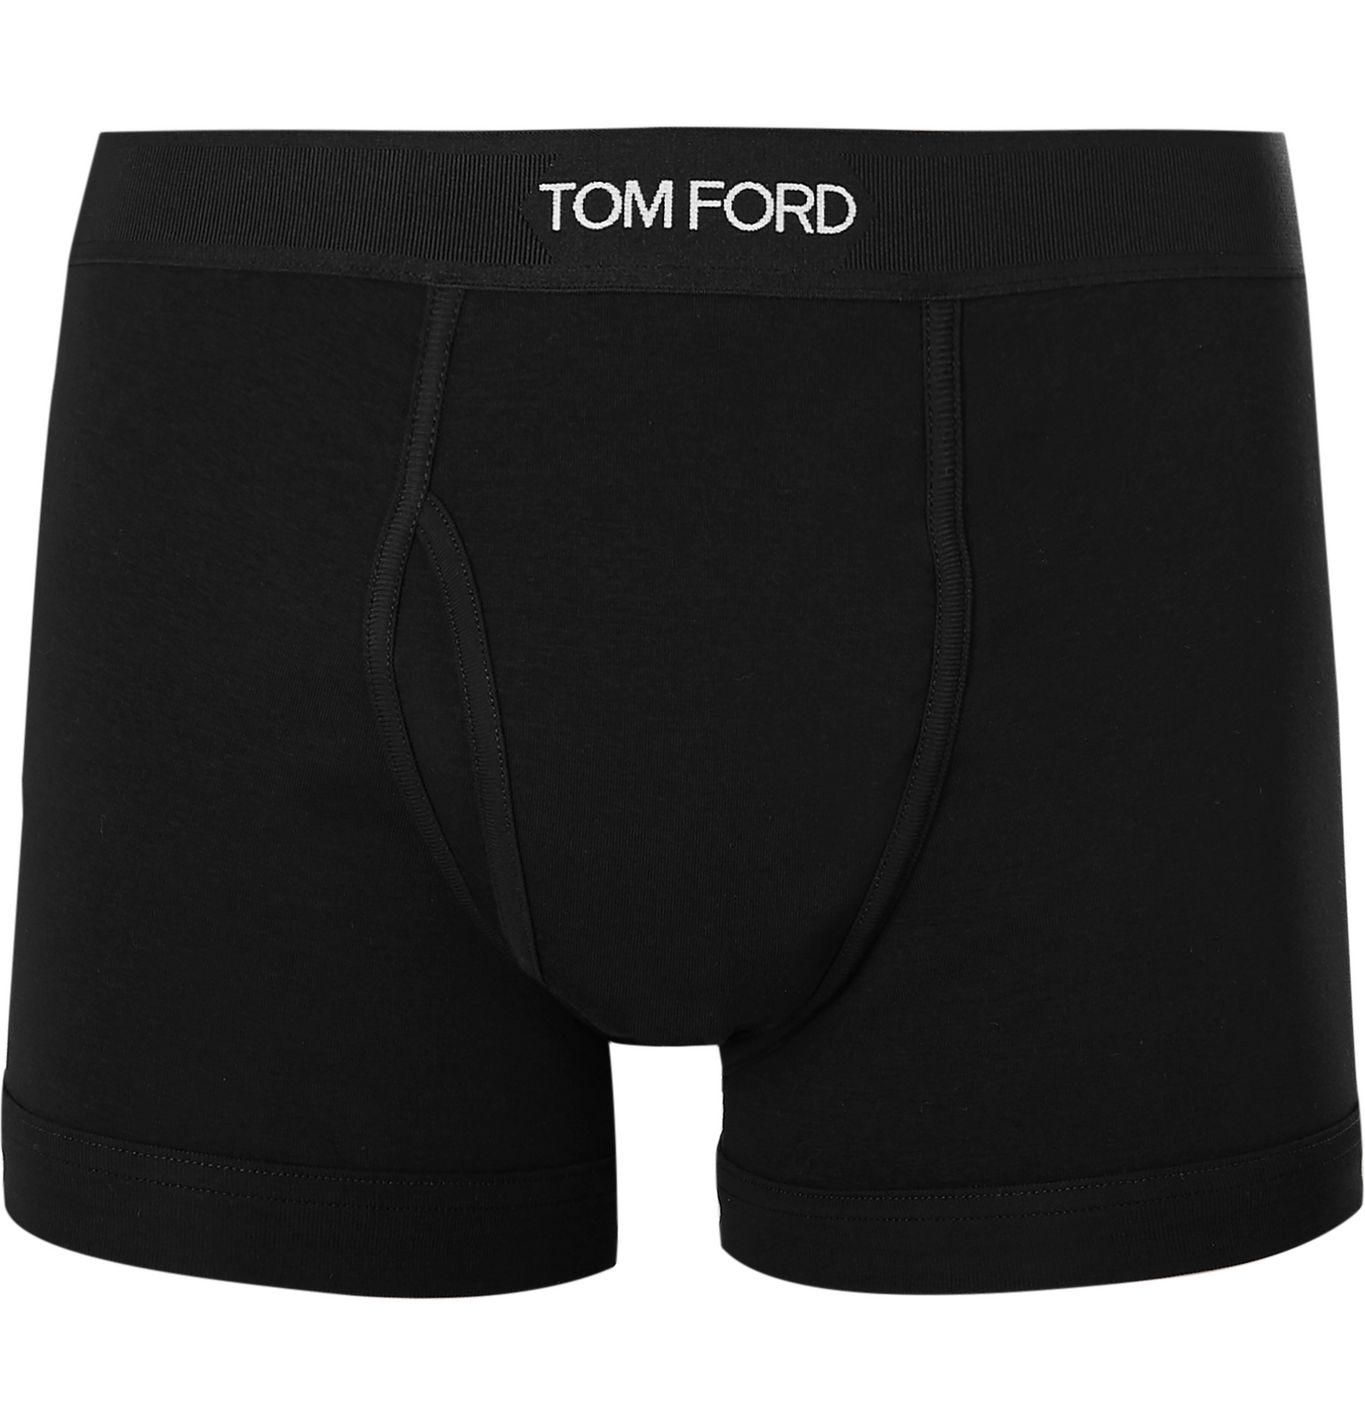 black boxer brief Tom Ford